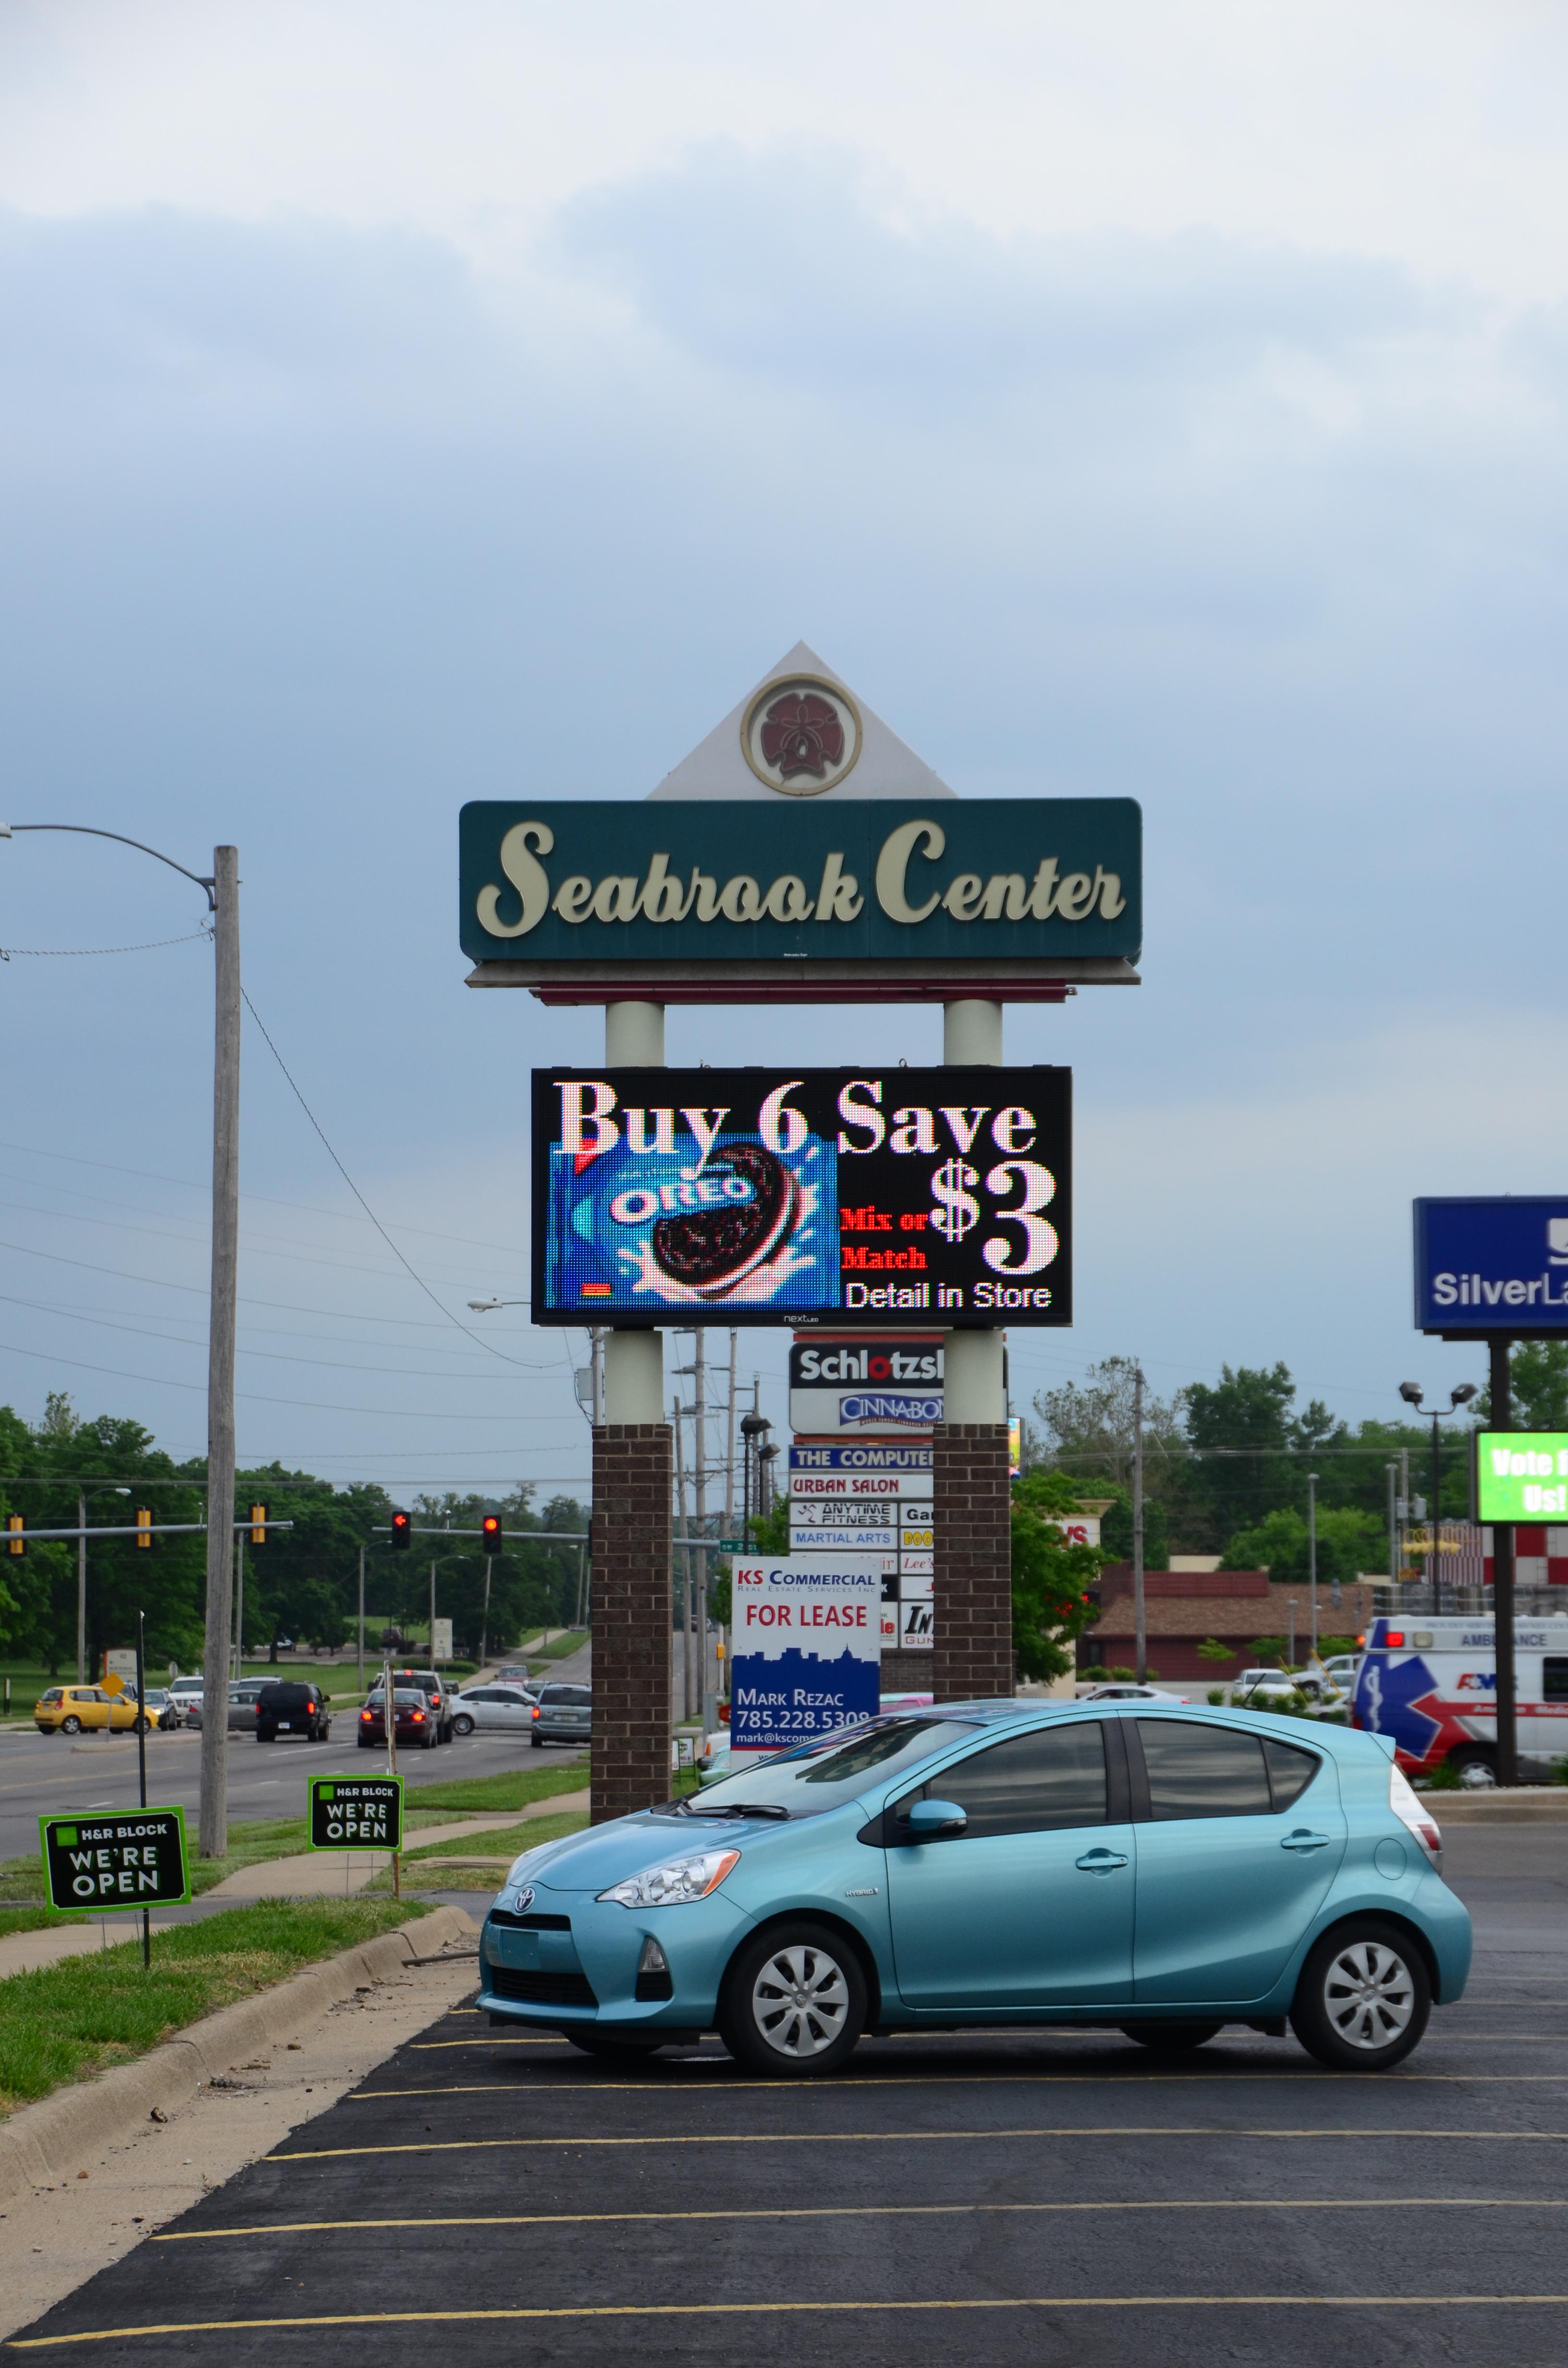 Seabrook Center